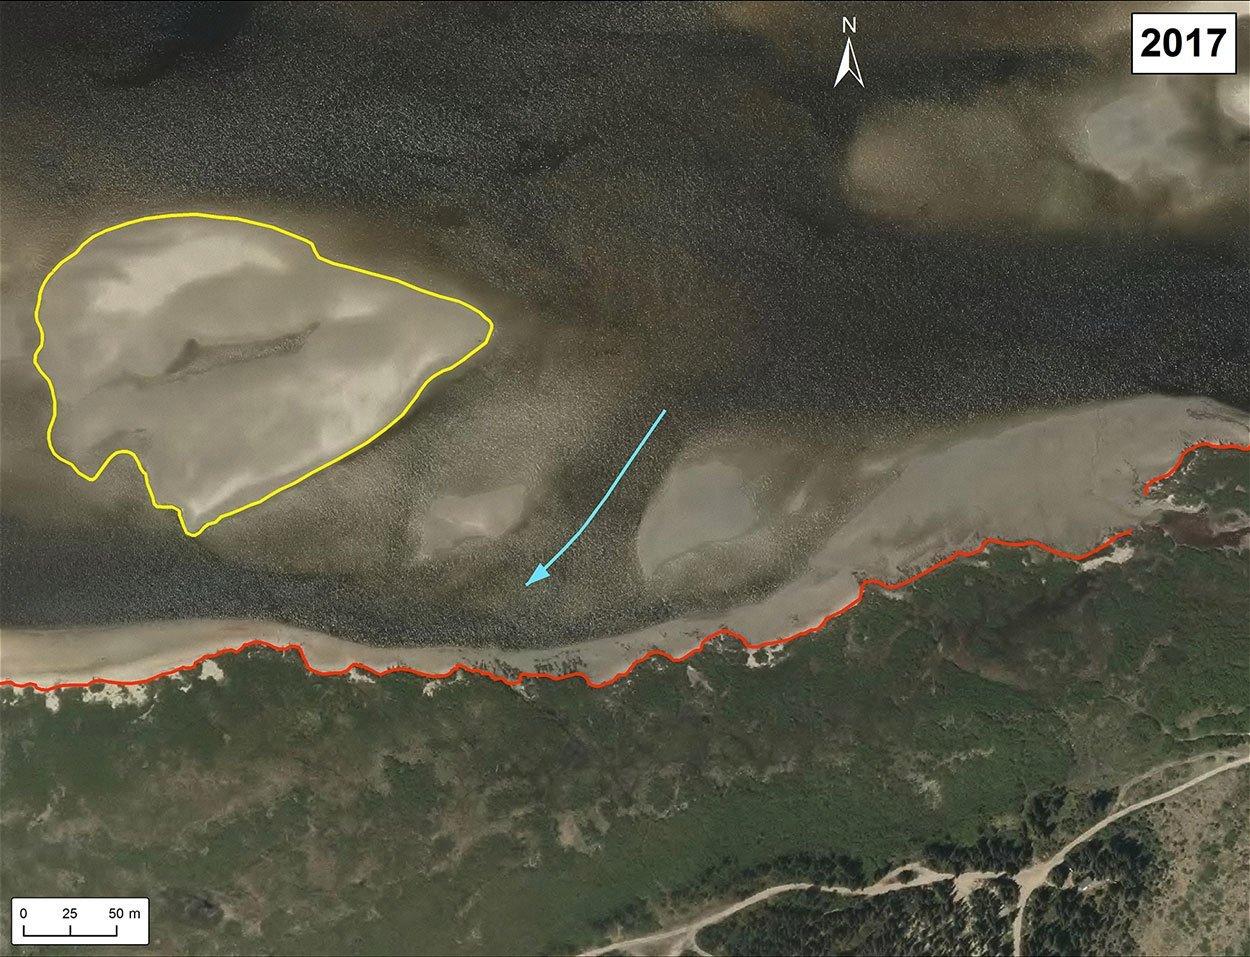 Erosion Chisasibi banc de sable 2017